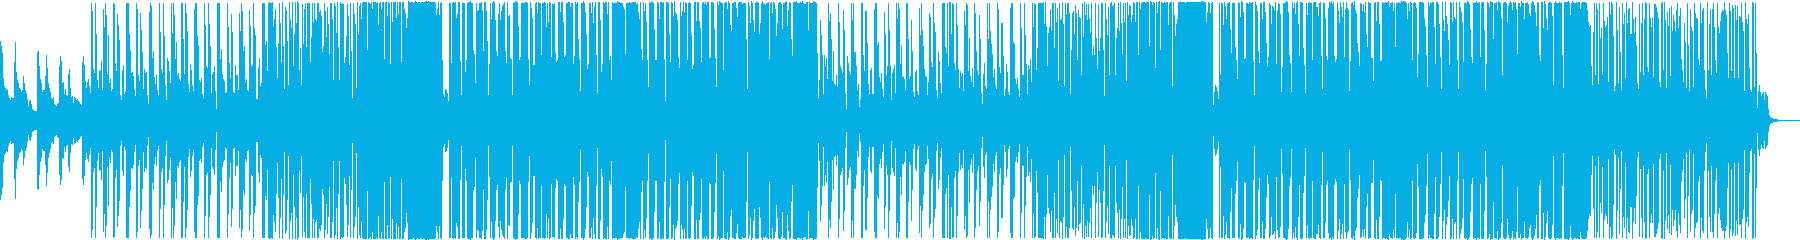 Kawaii系Future Bass 1の再生済みの波形